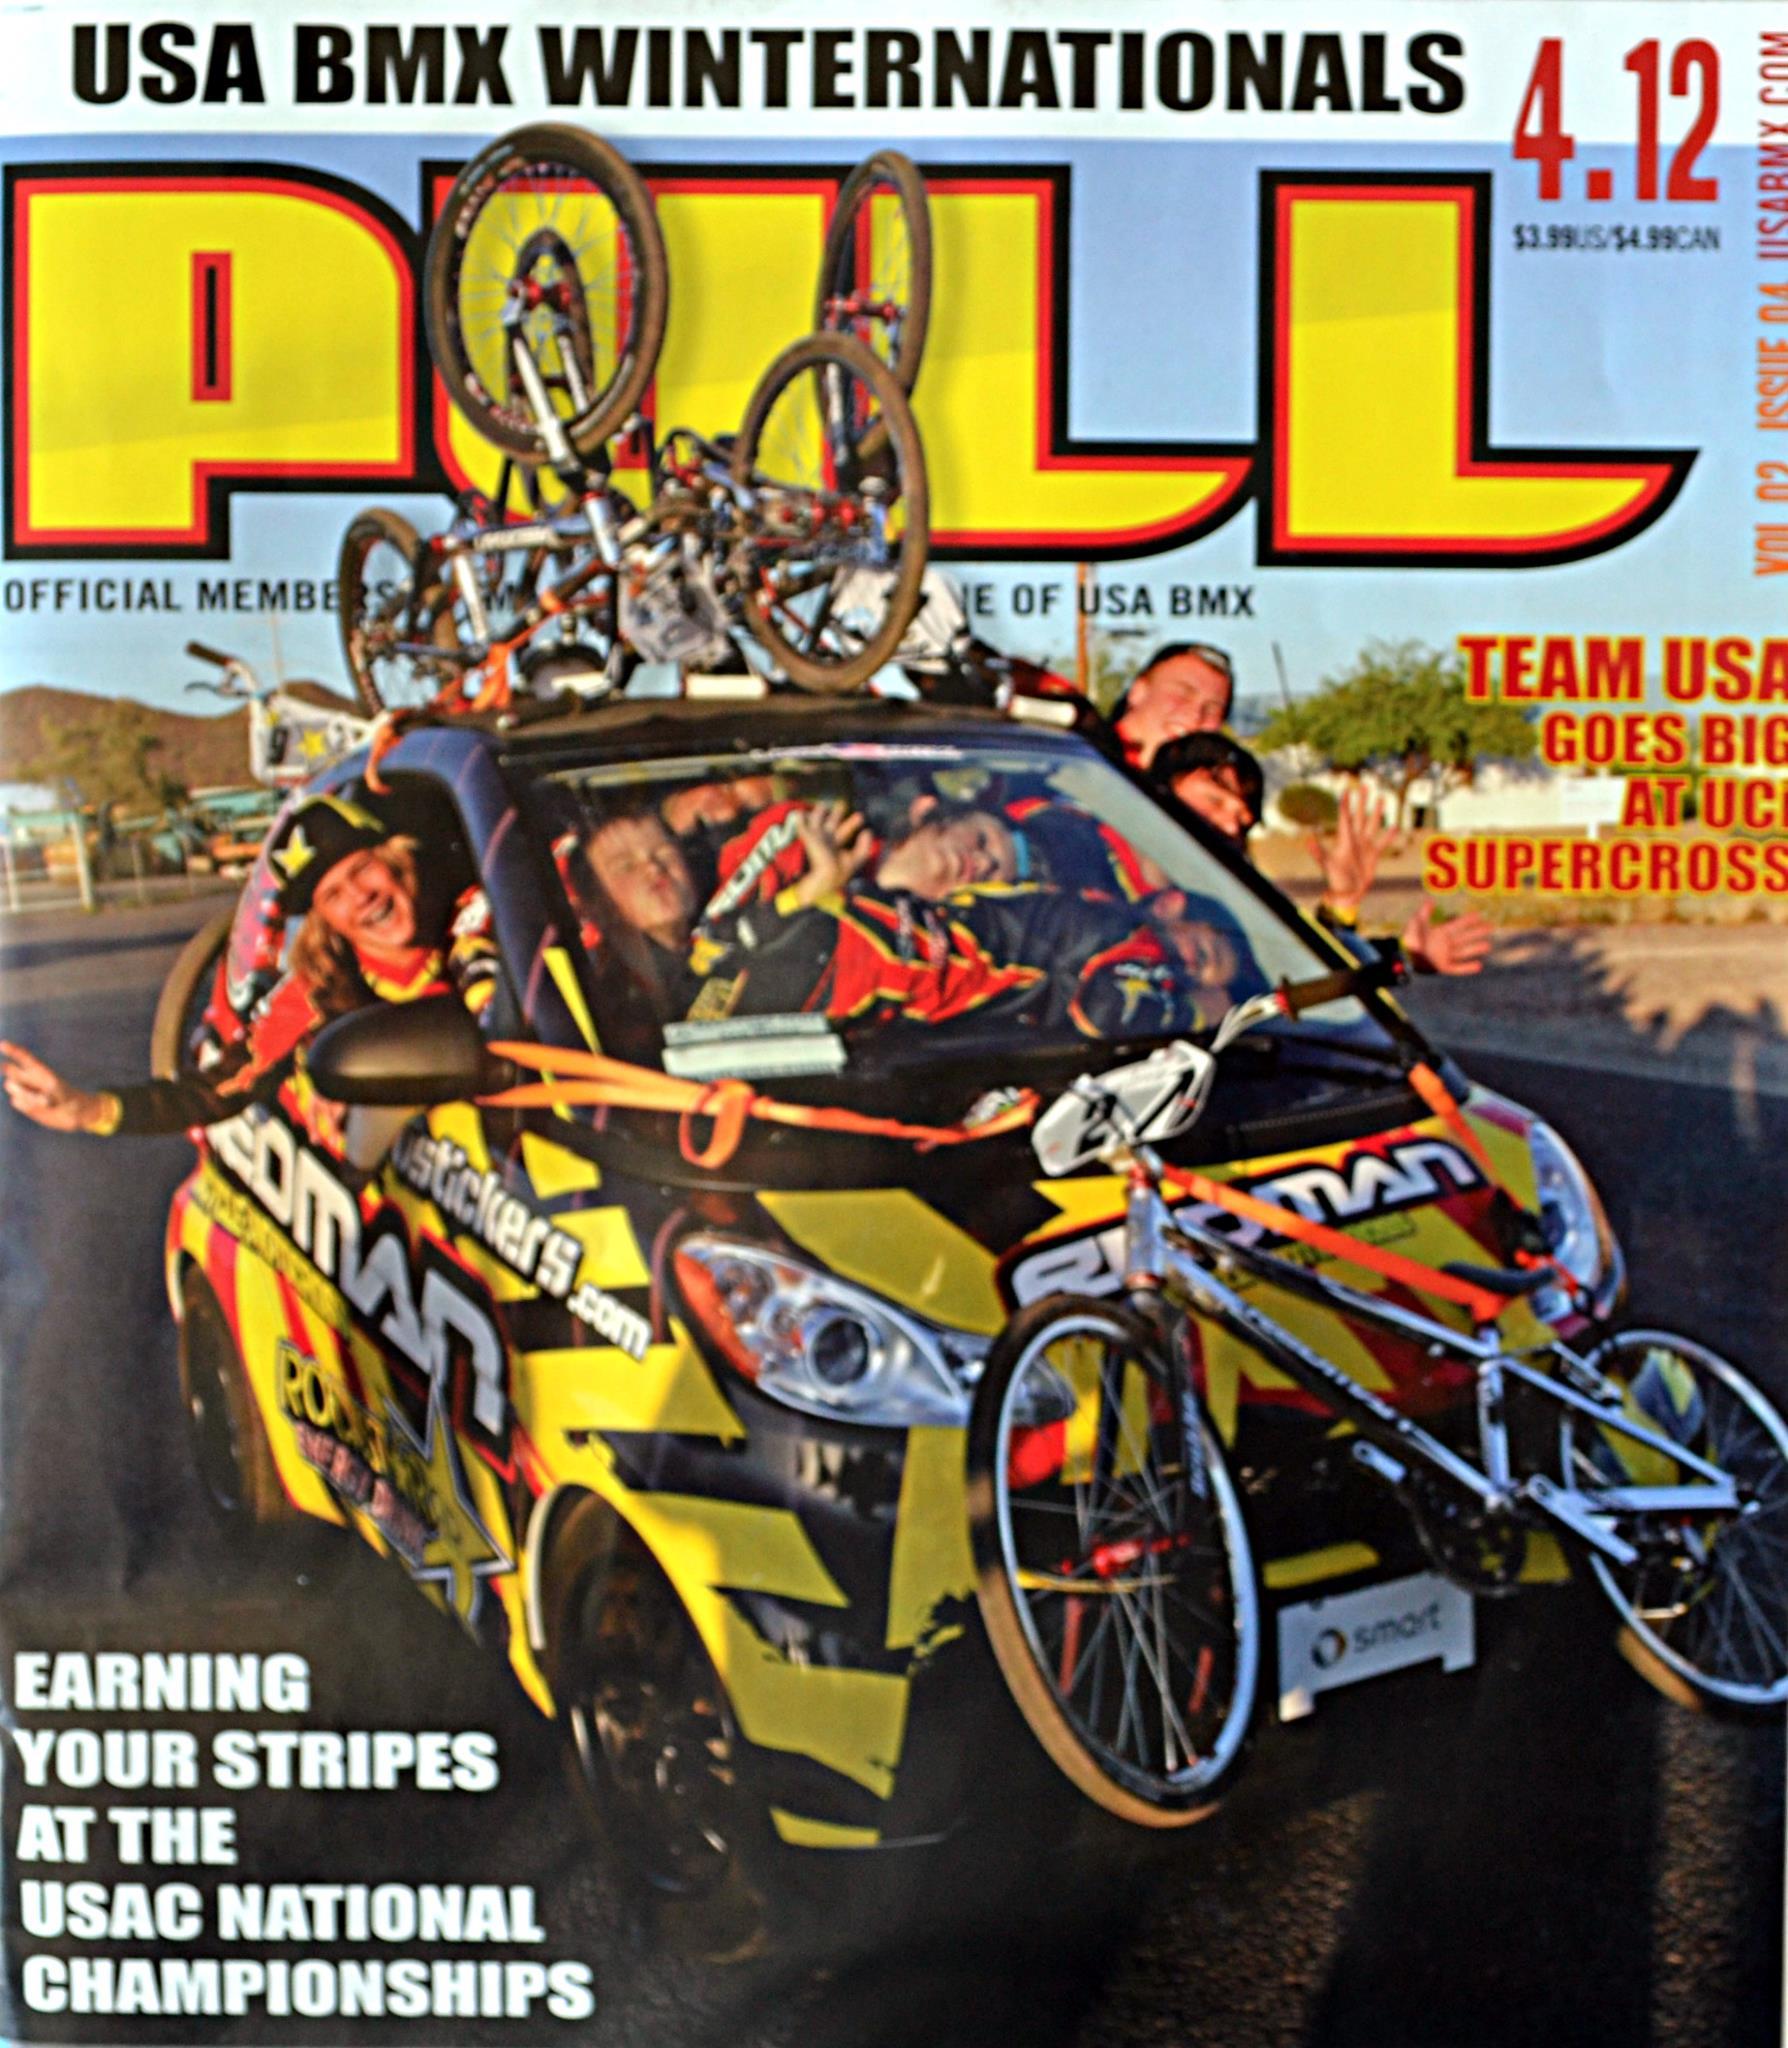 Redman BMX | cruiser revolution